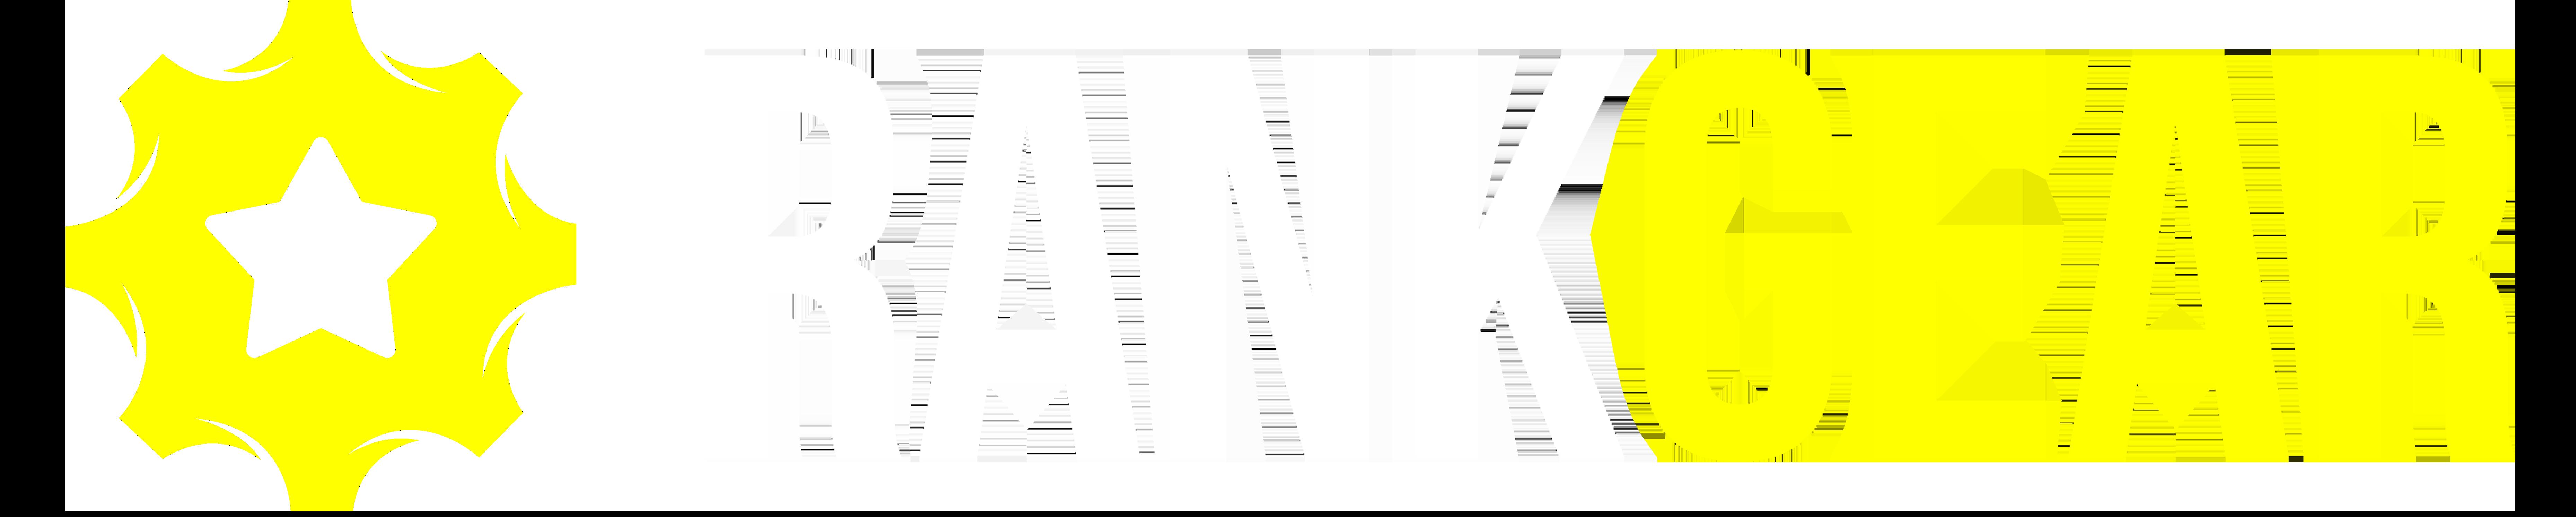 Rank Gear logo